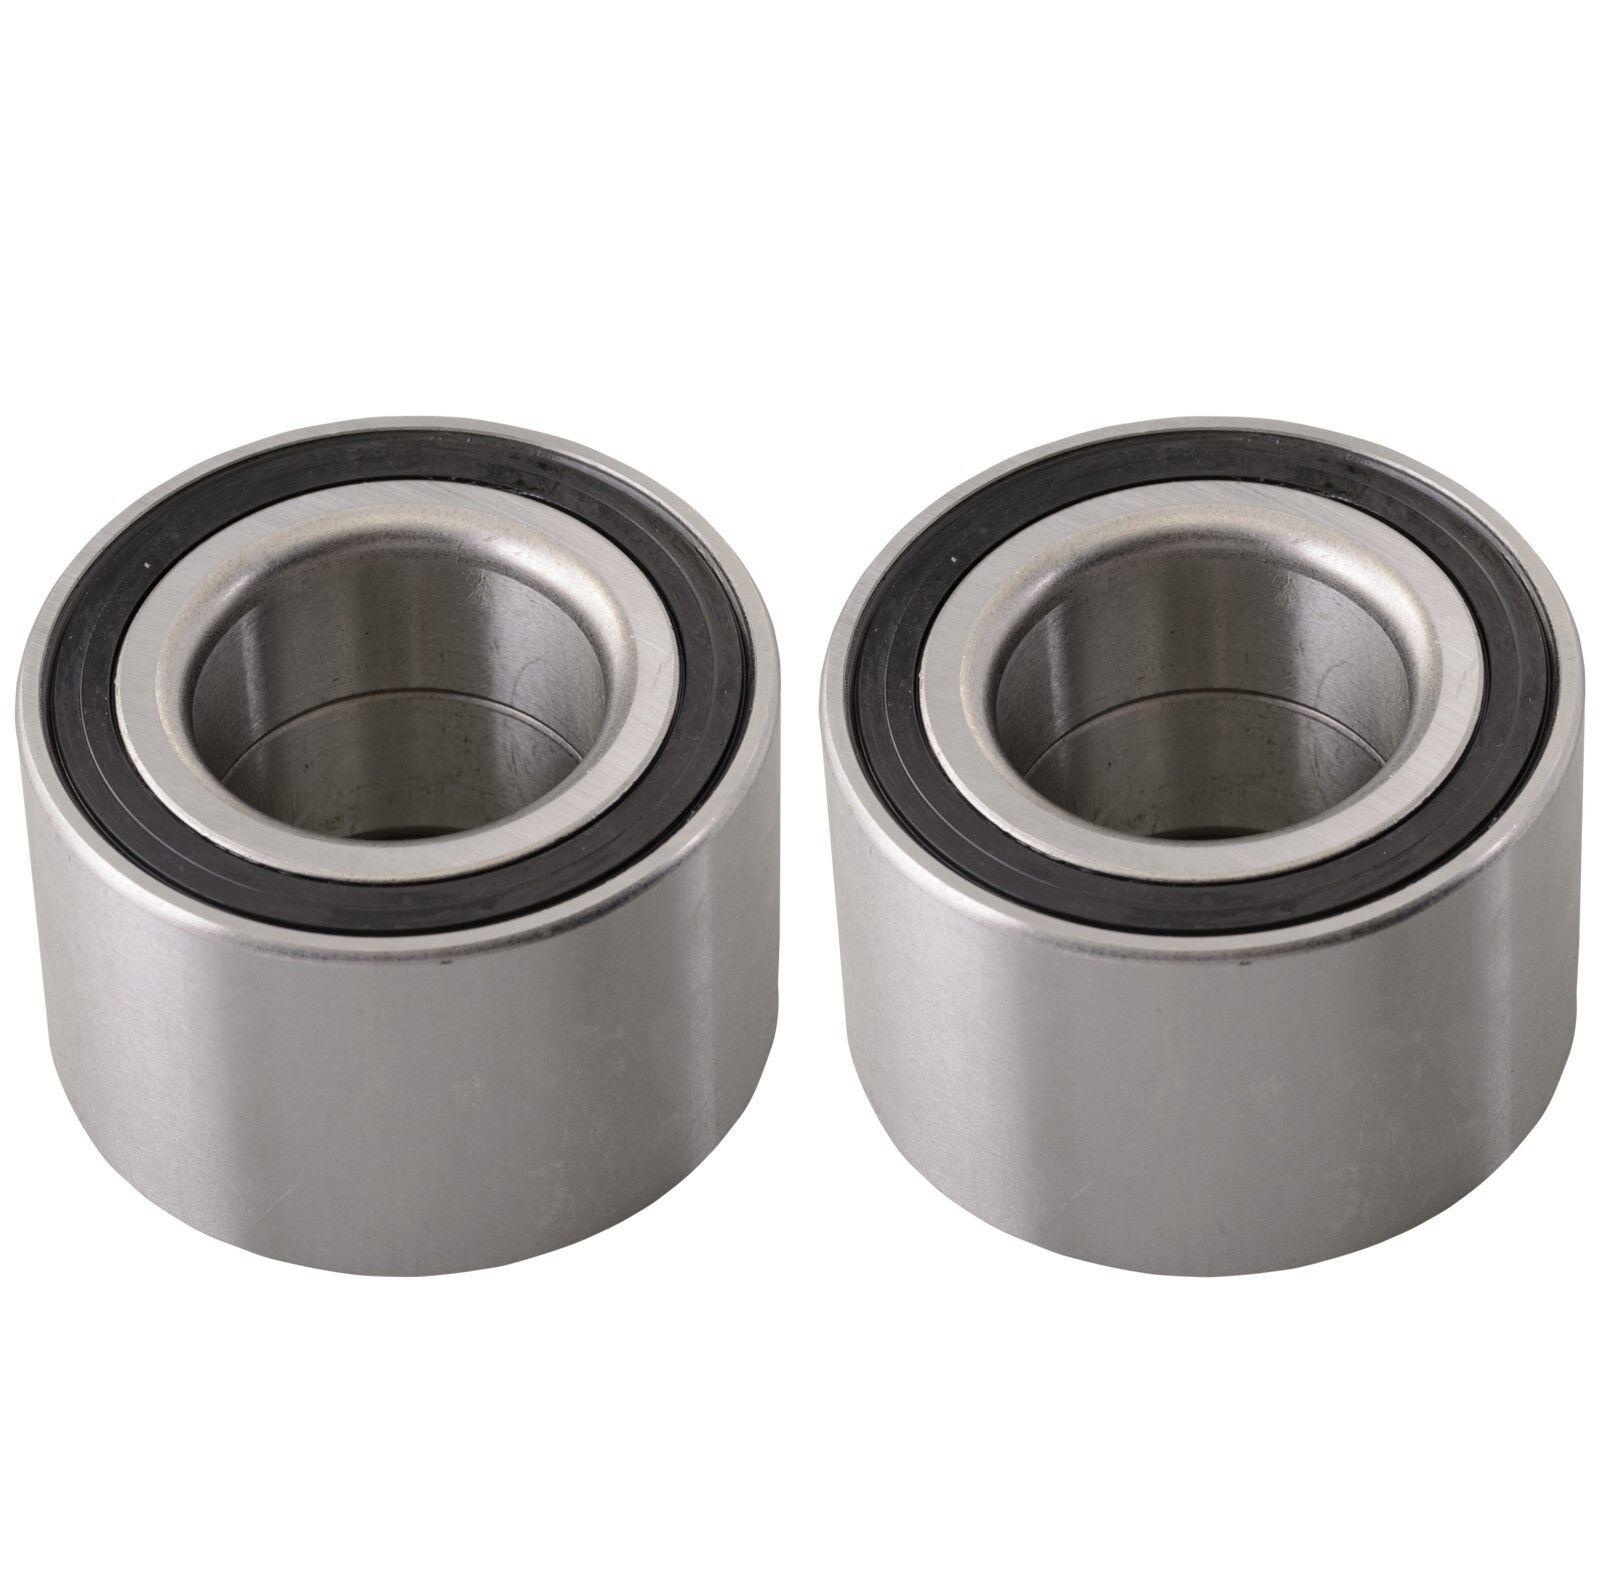 Rear Wheel Ball Bearings Fits POLARIS SPORTSMAN 700 2002 2003 2004 2005 2006